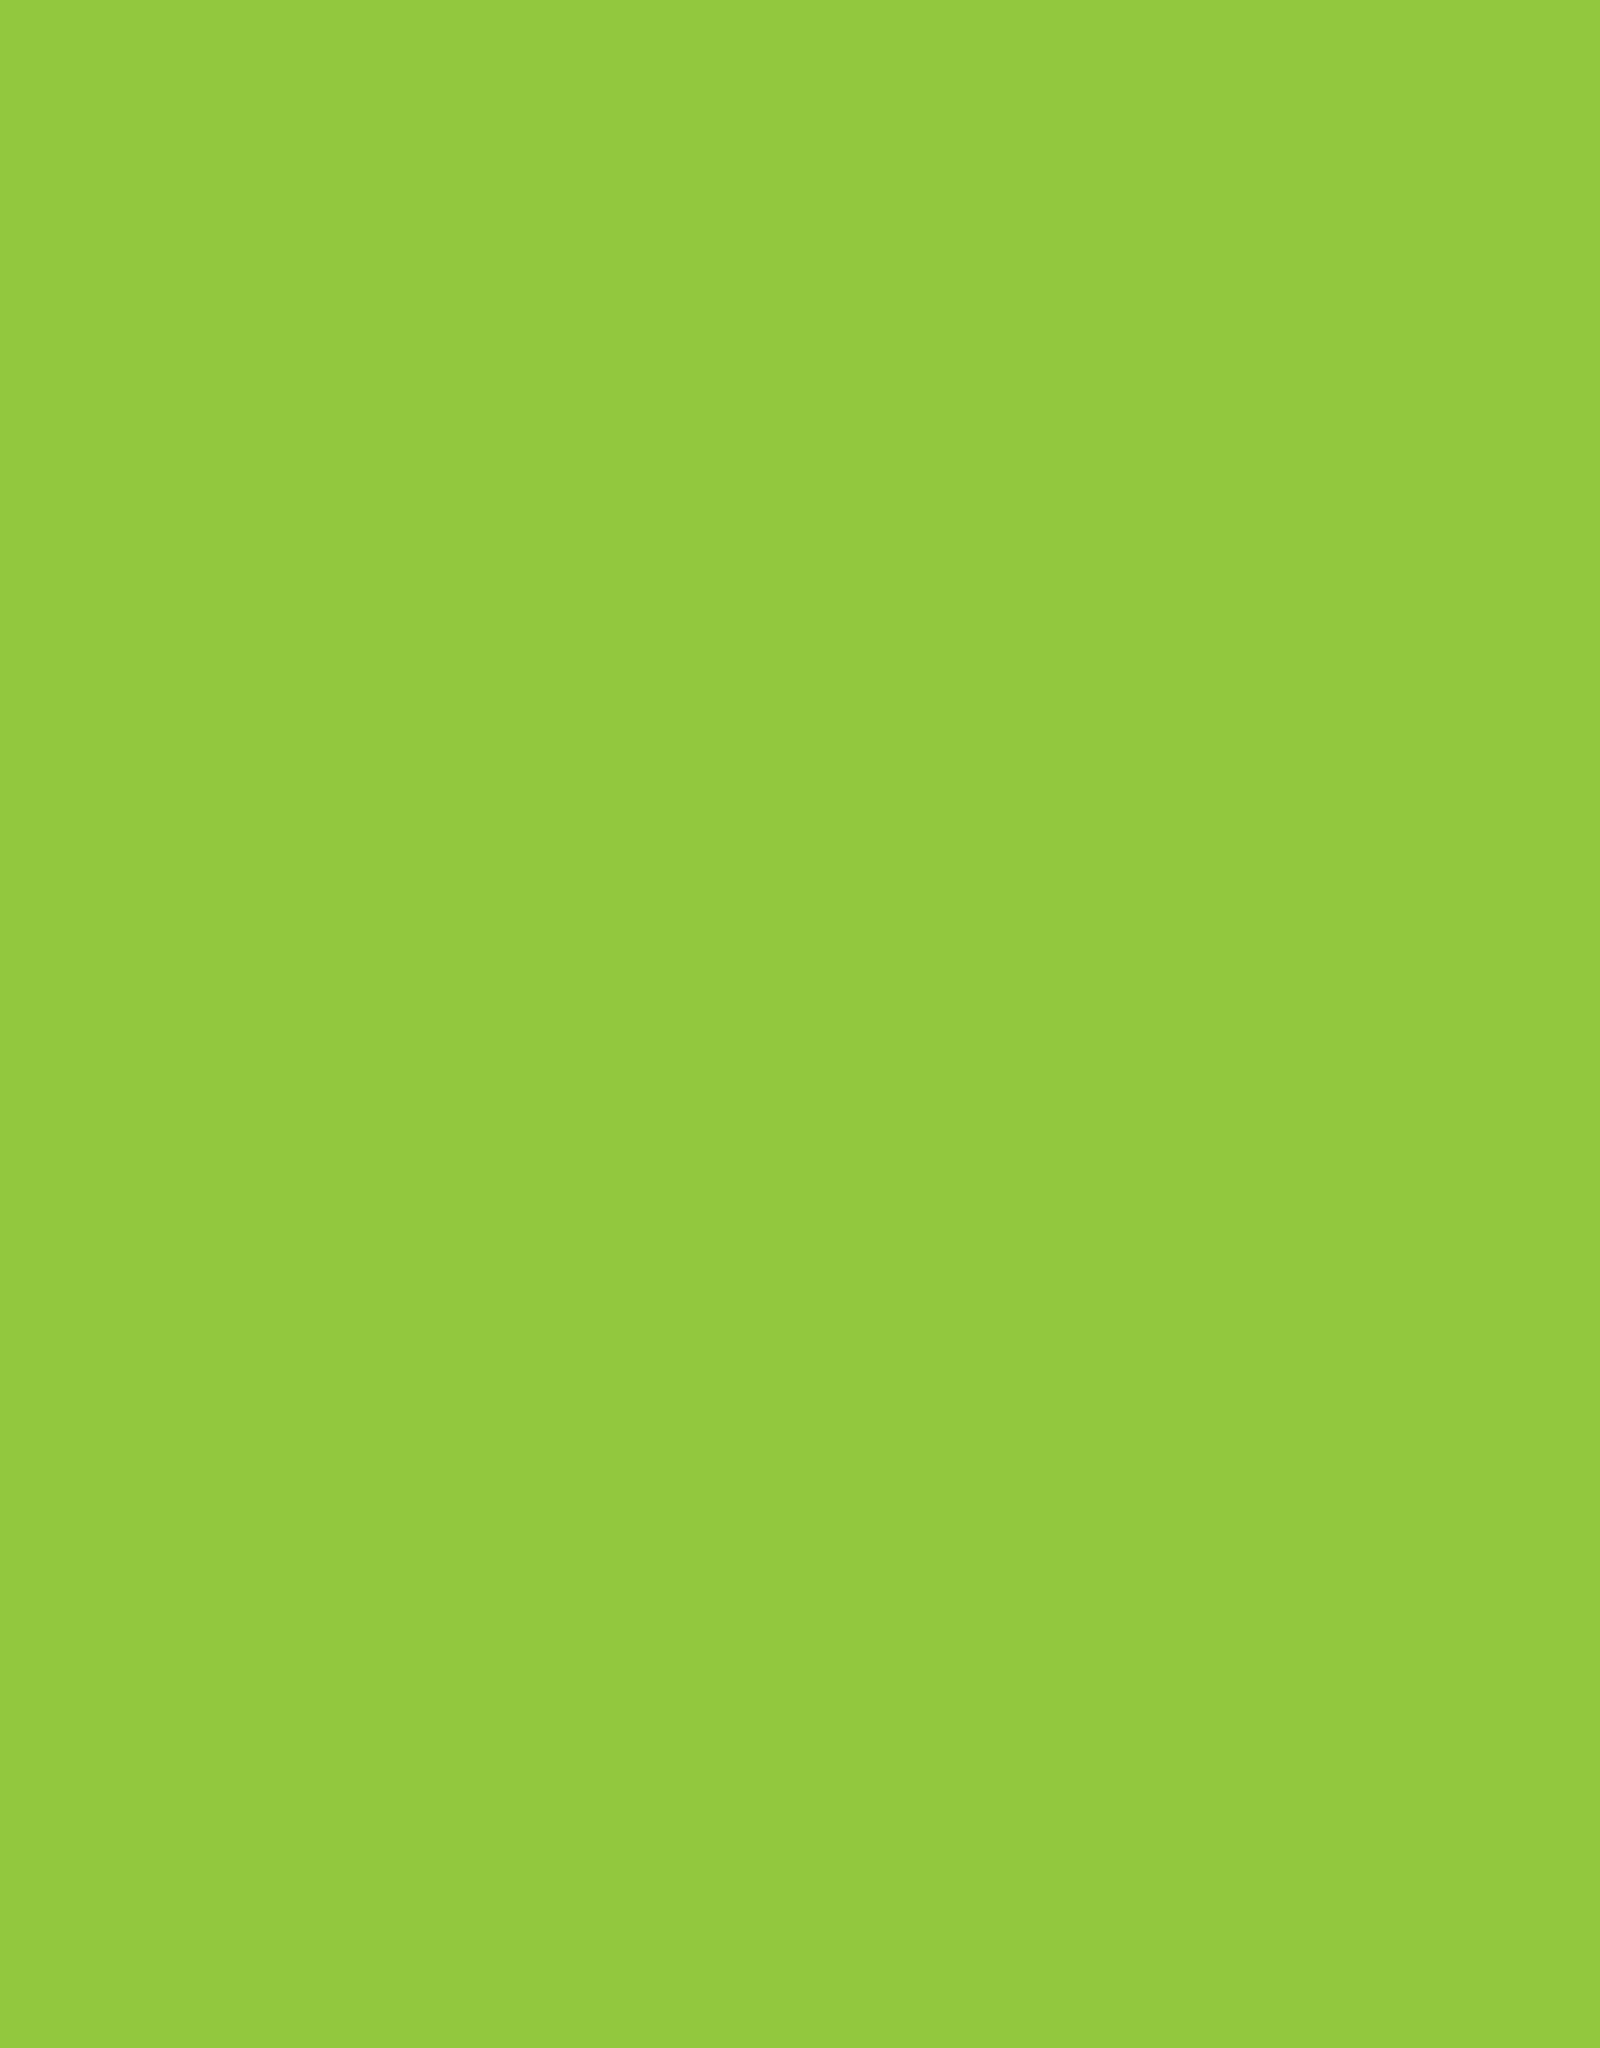 Paspel - Lime